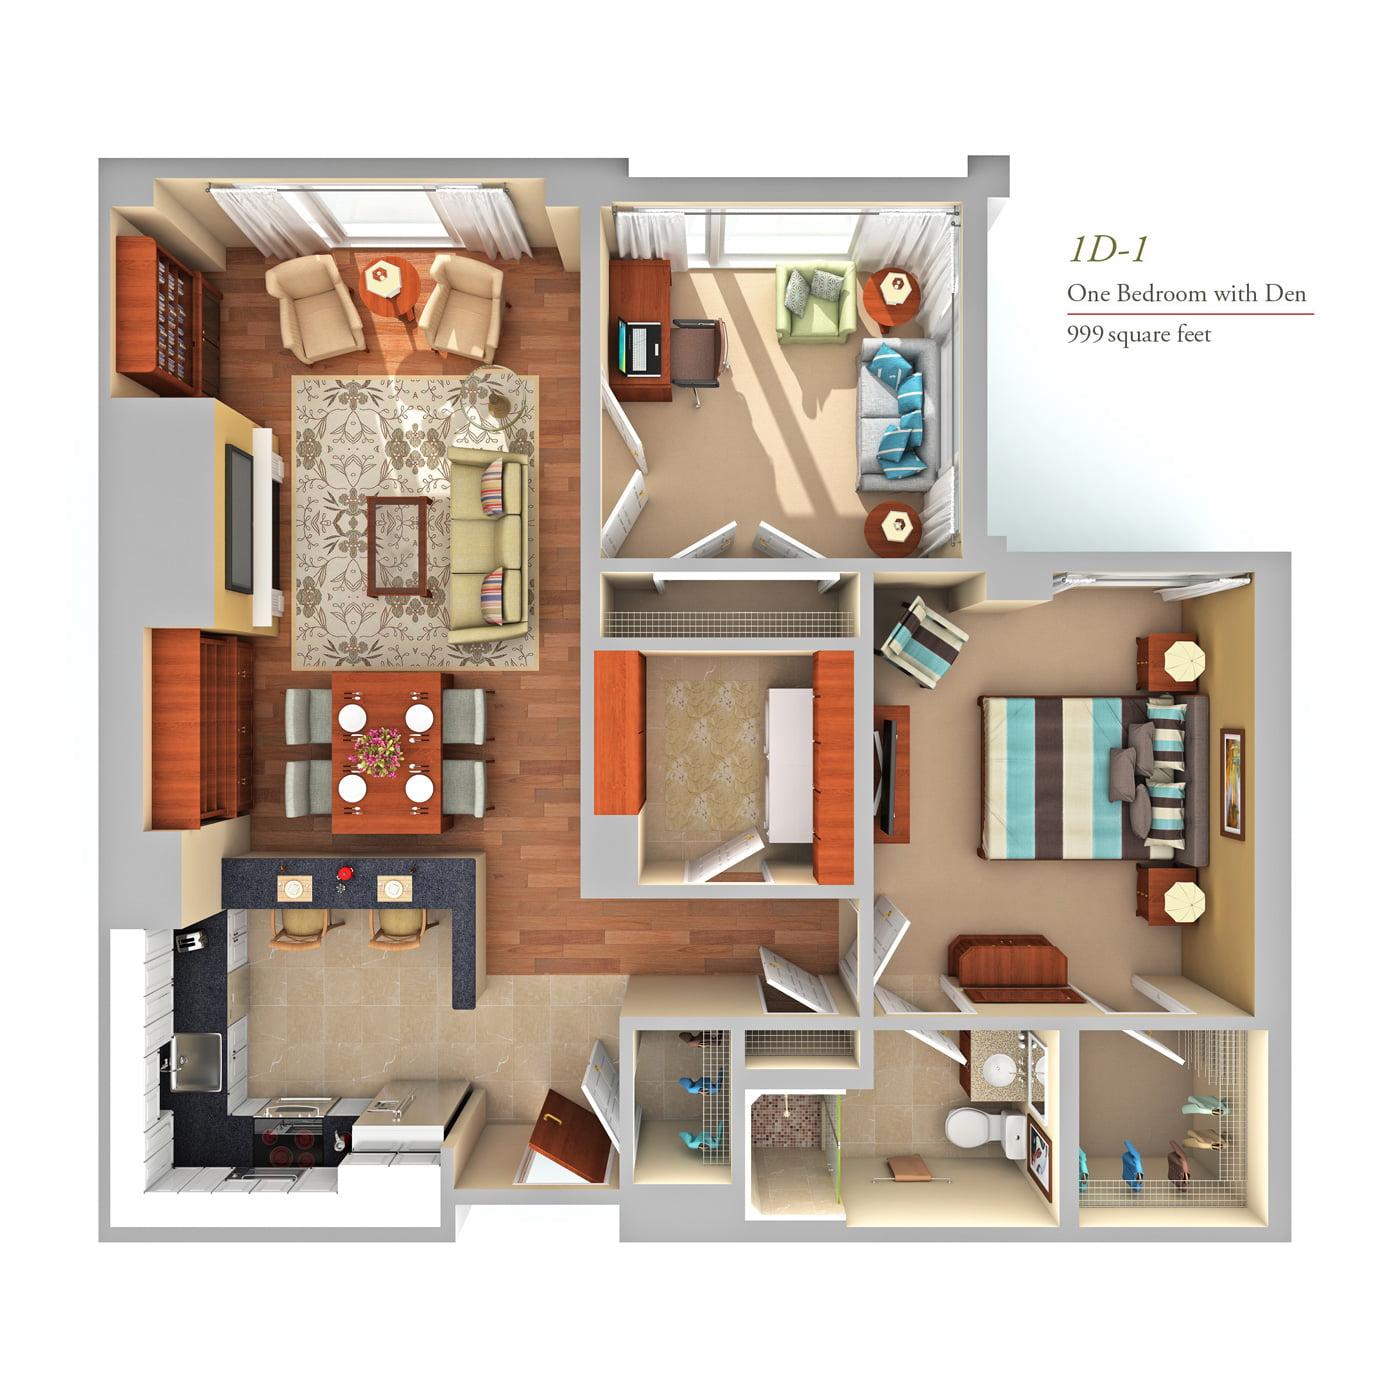 Luxury condo floor plans fox hill in bethesda md for Condo plans free